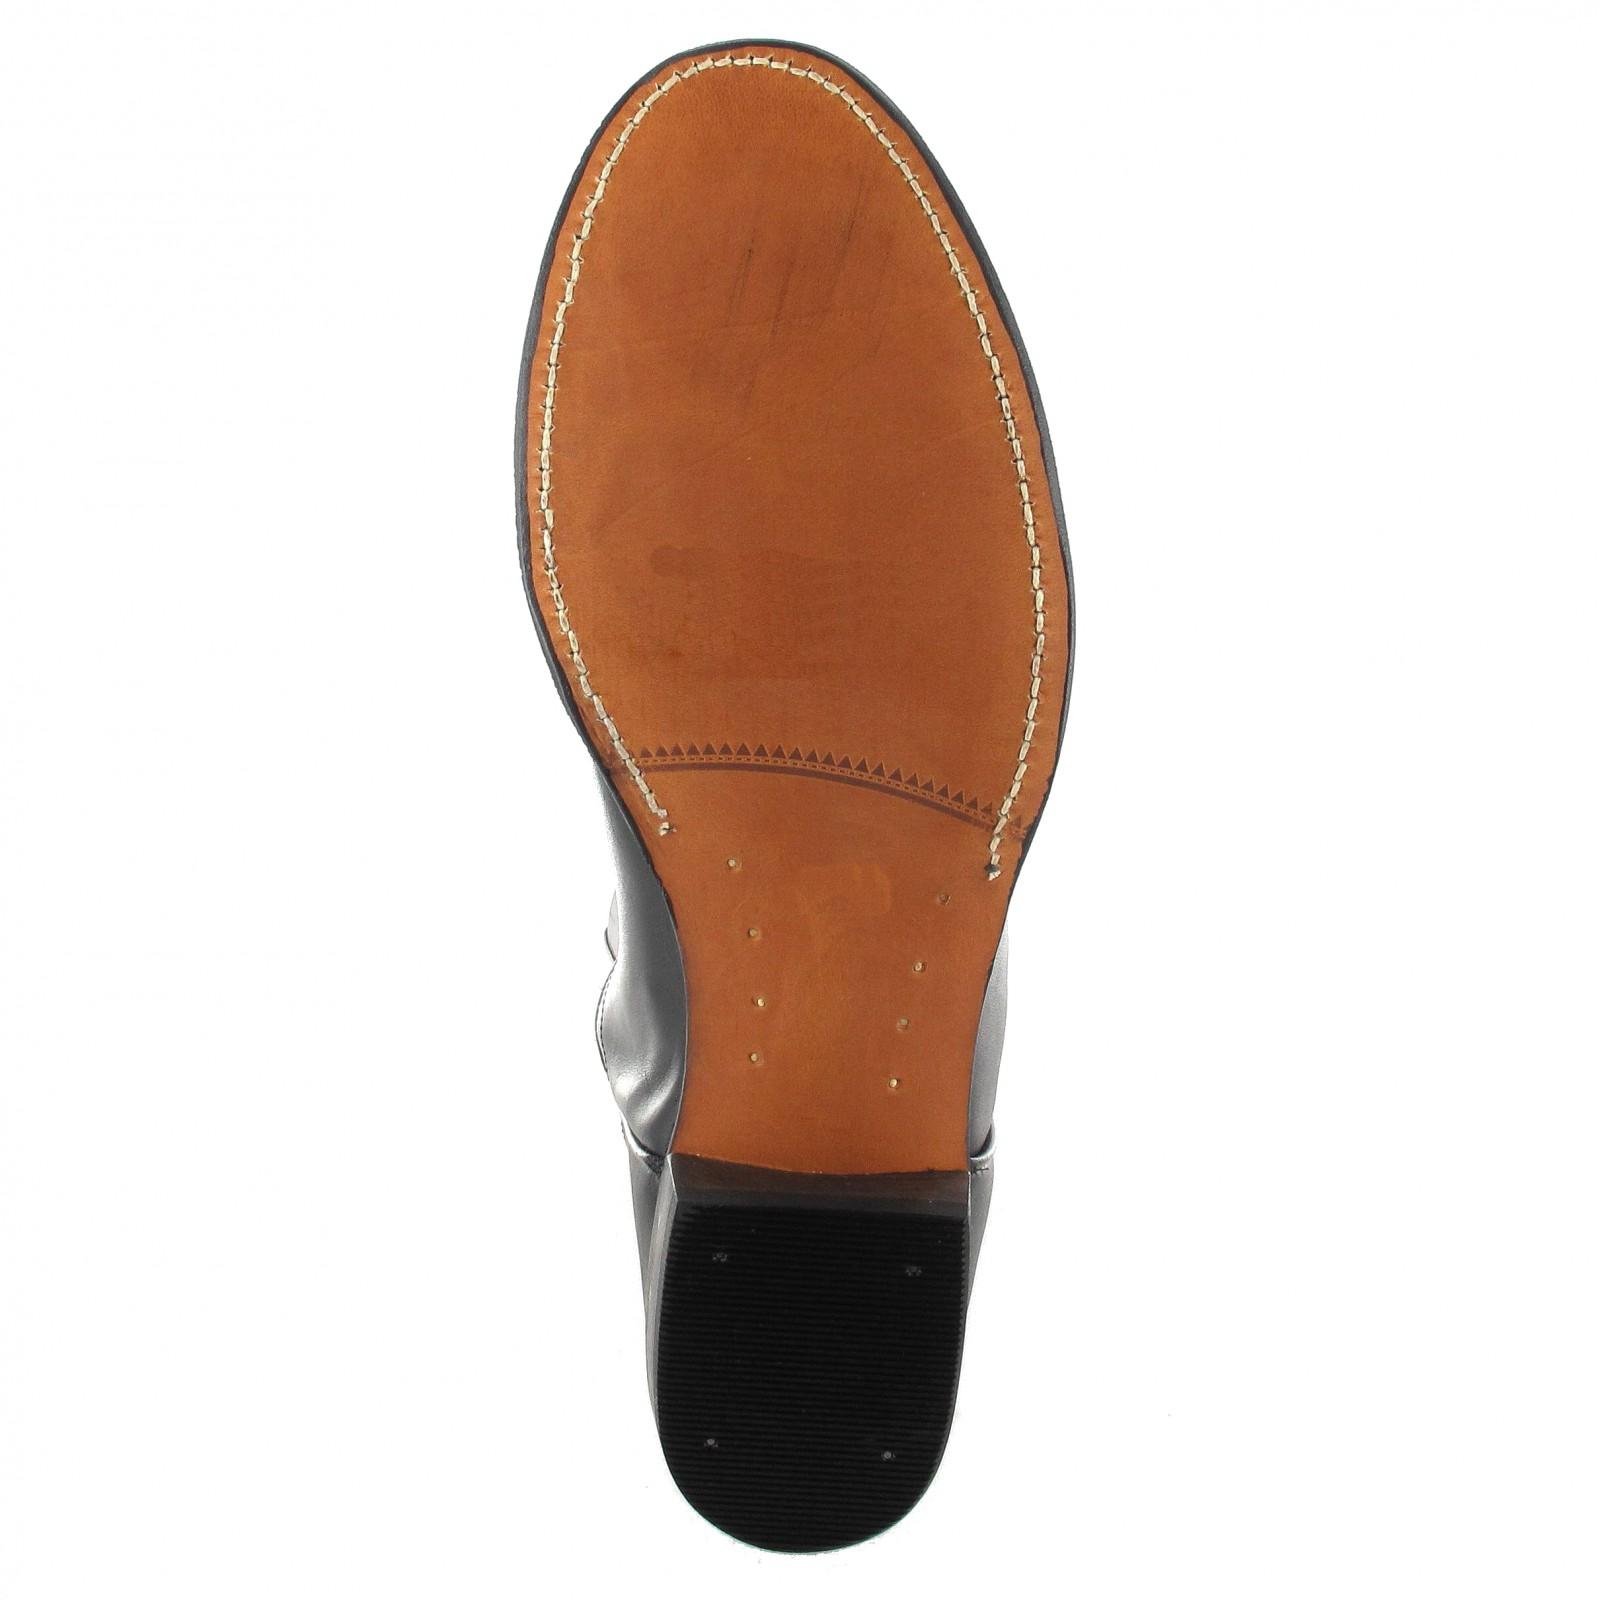 Tony Mora 1257 U Negro Western boot - black | Fashion Boots